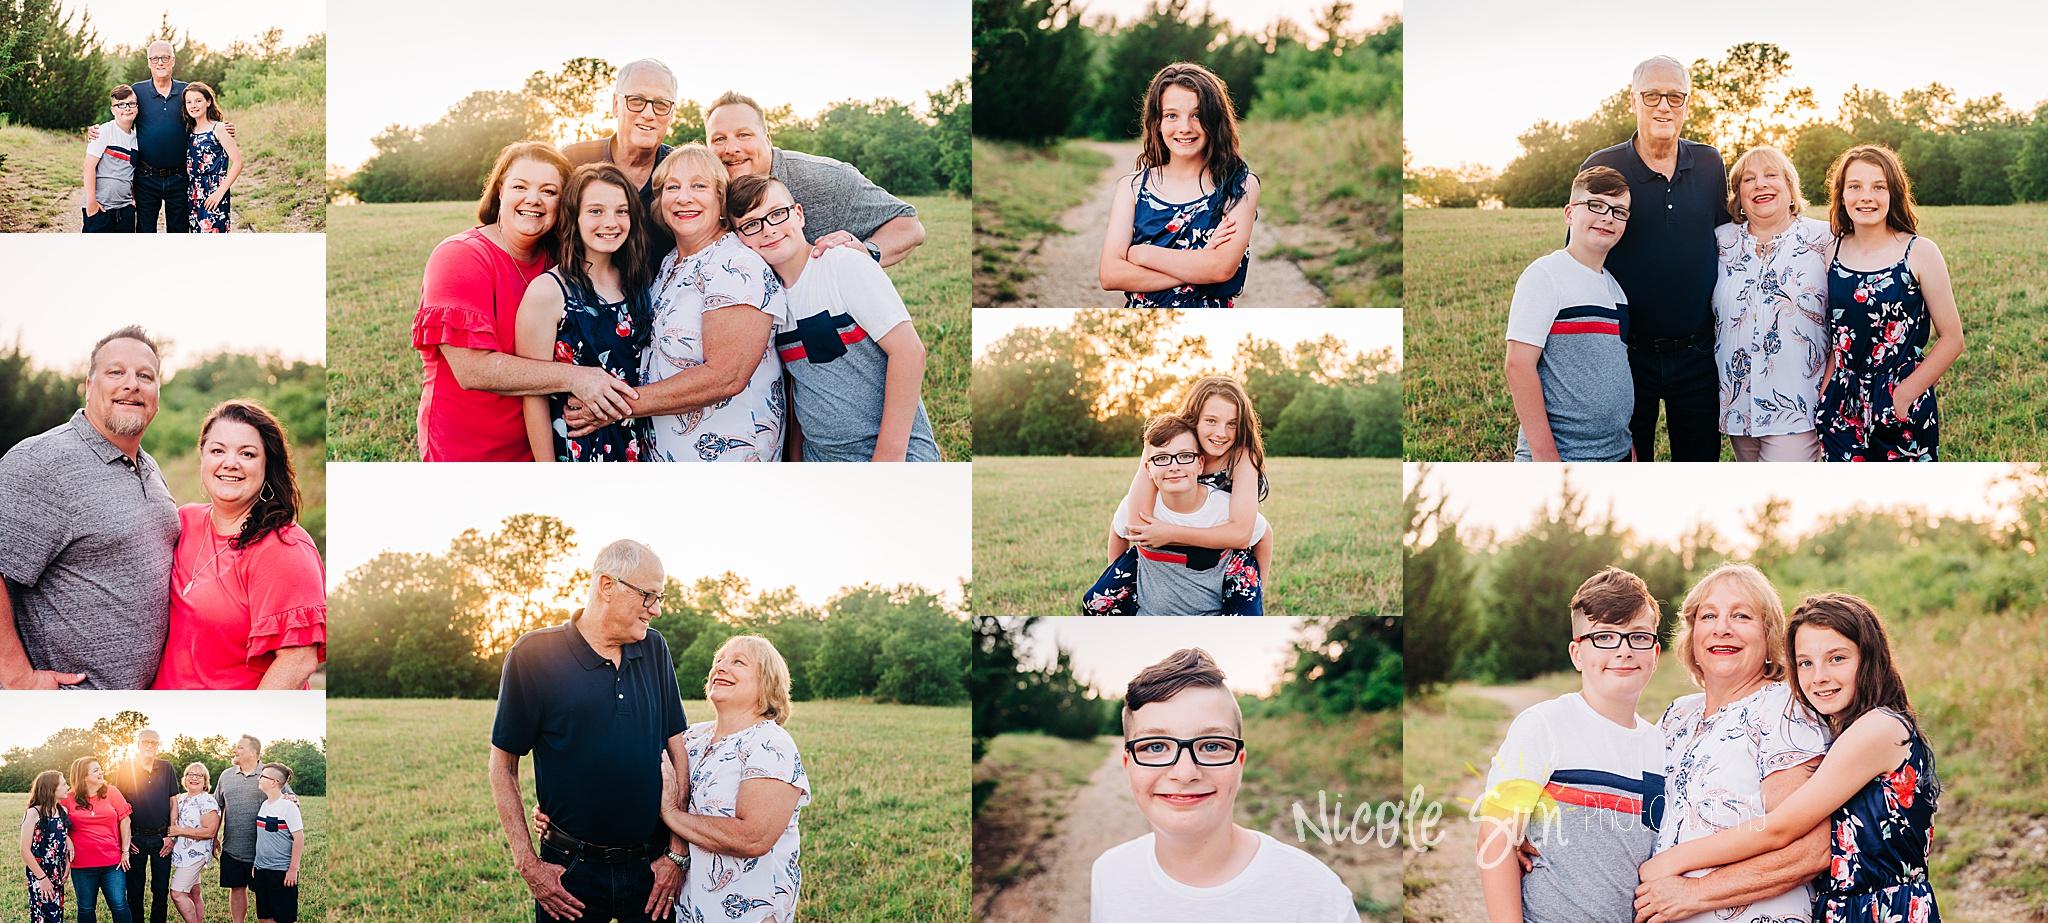 dfwextendedfamilyphotographer.jpg